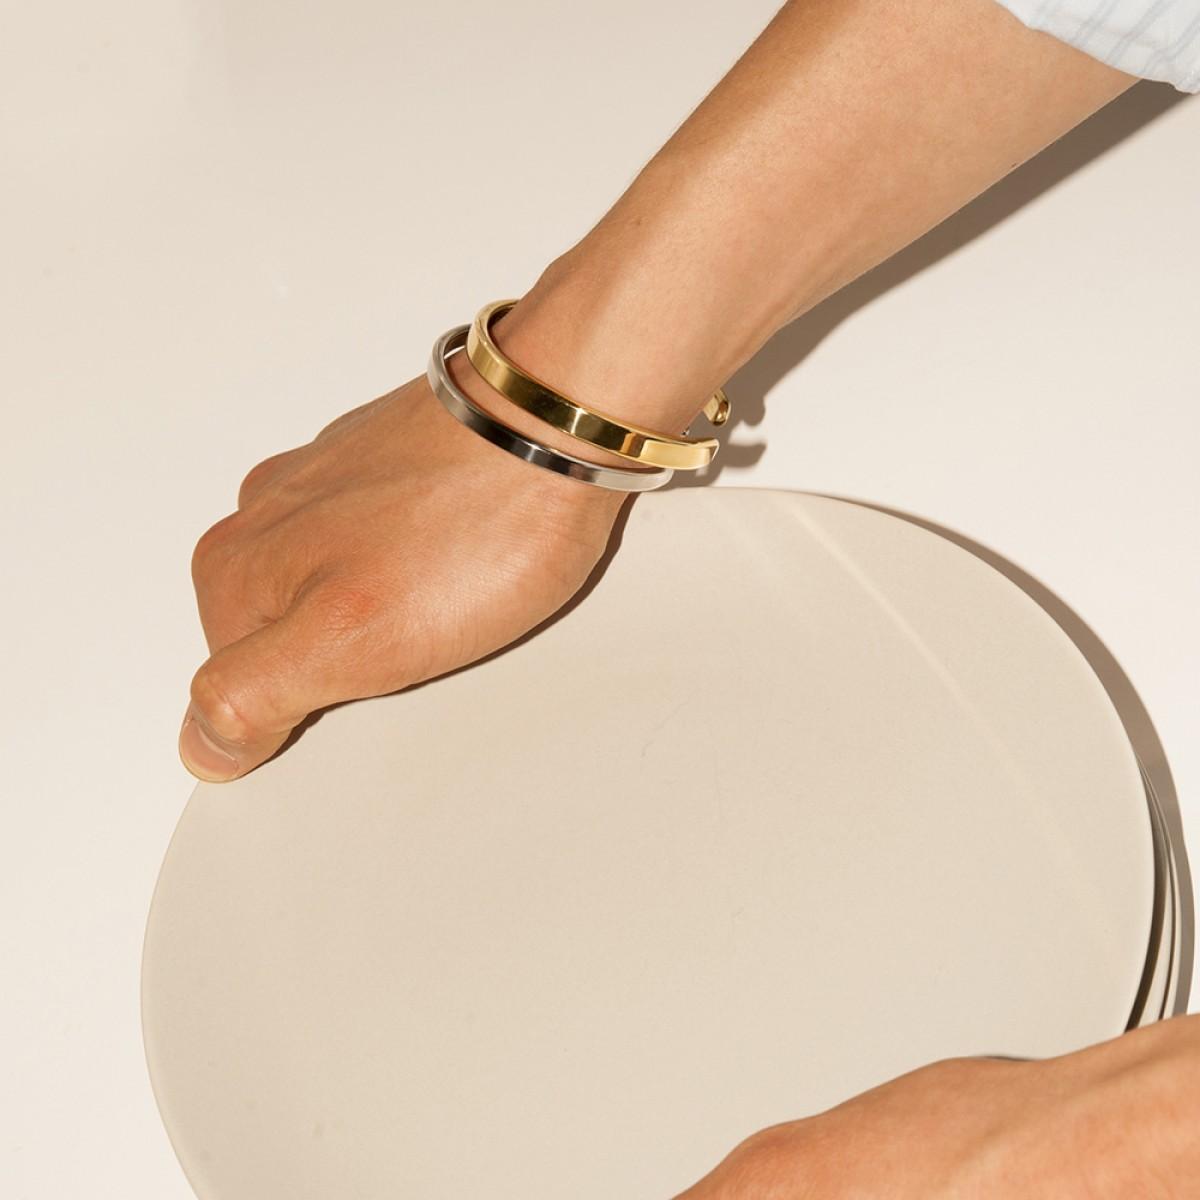 Lois Mathar – Armband Messing, breit, 6 mm